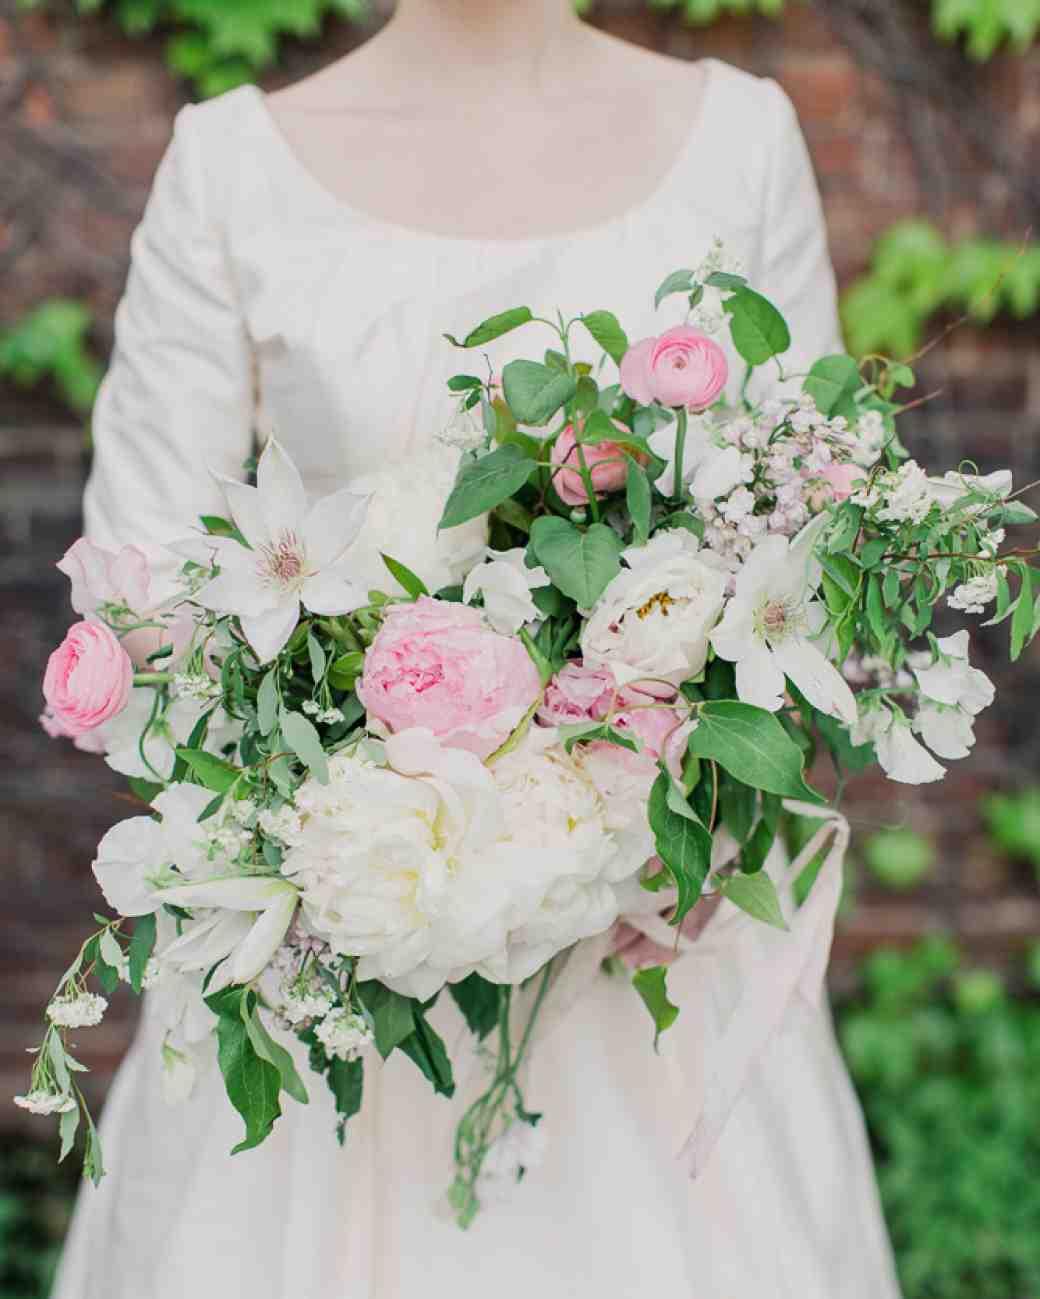 Bridal Bouquet Garden Roses : Peonies and garden roses wedding bouquet creative ads